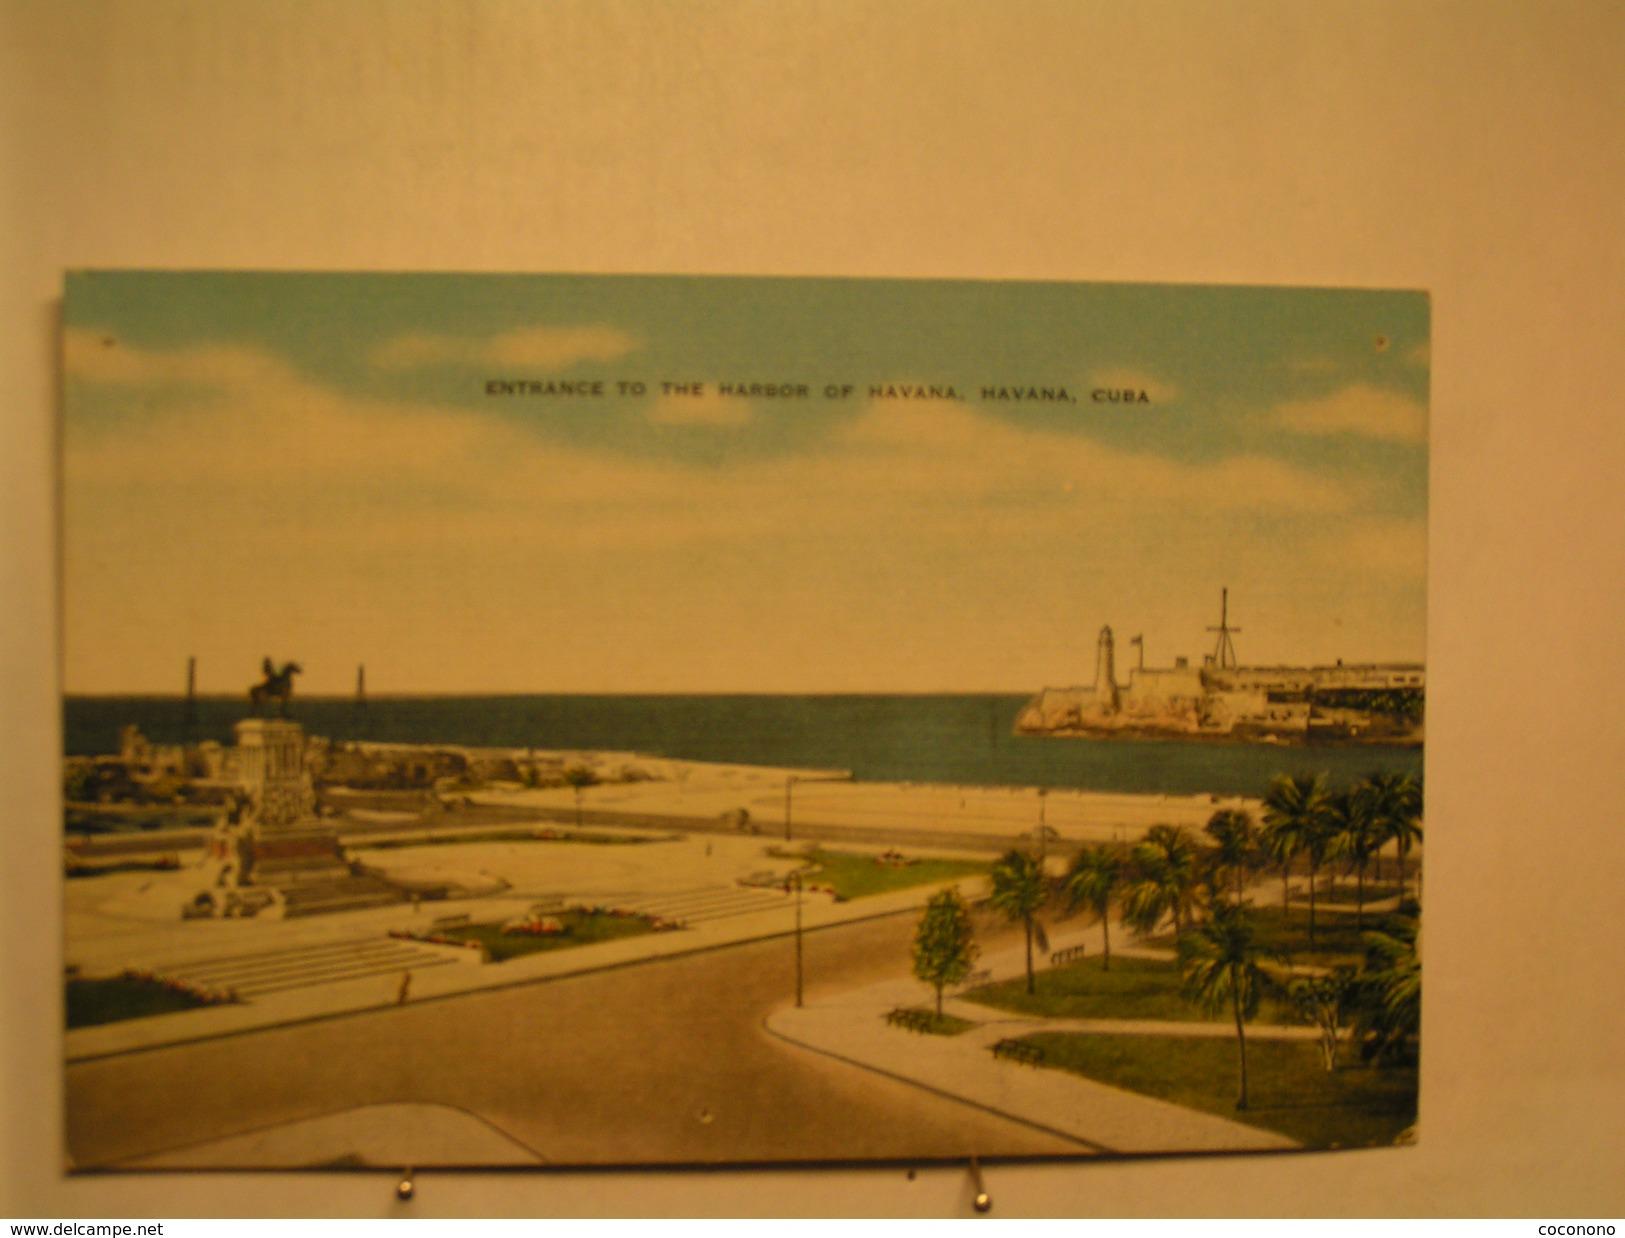 Havana - Entrance To The Harbor Of Havana - Cuba